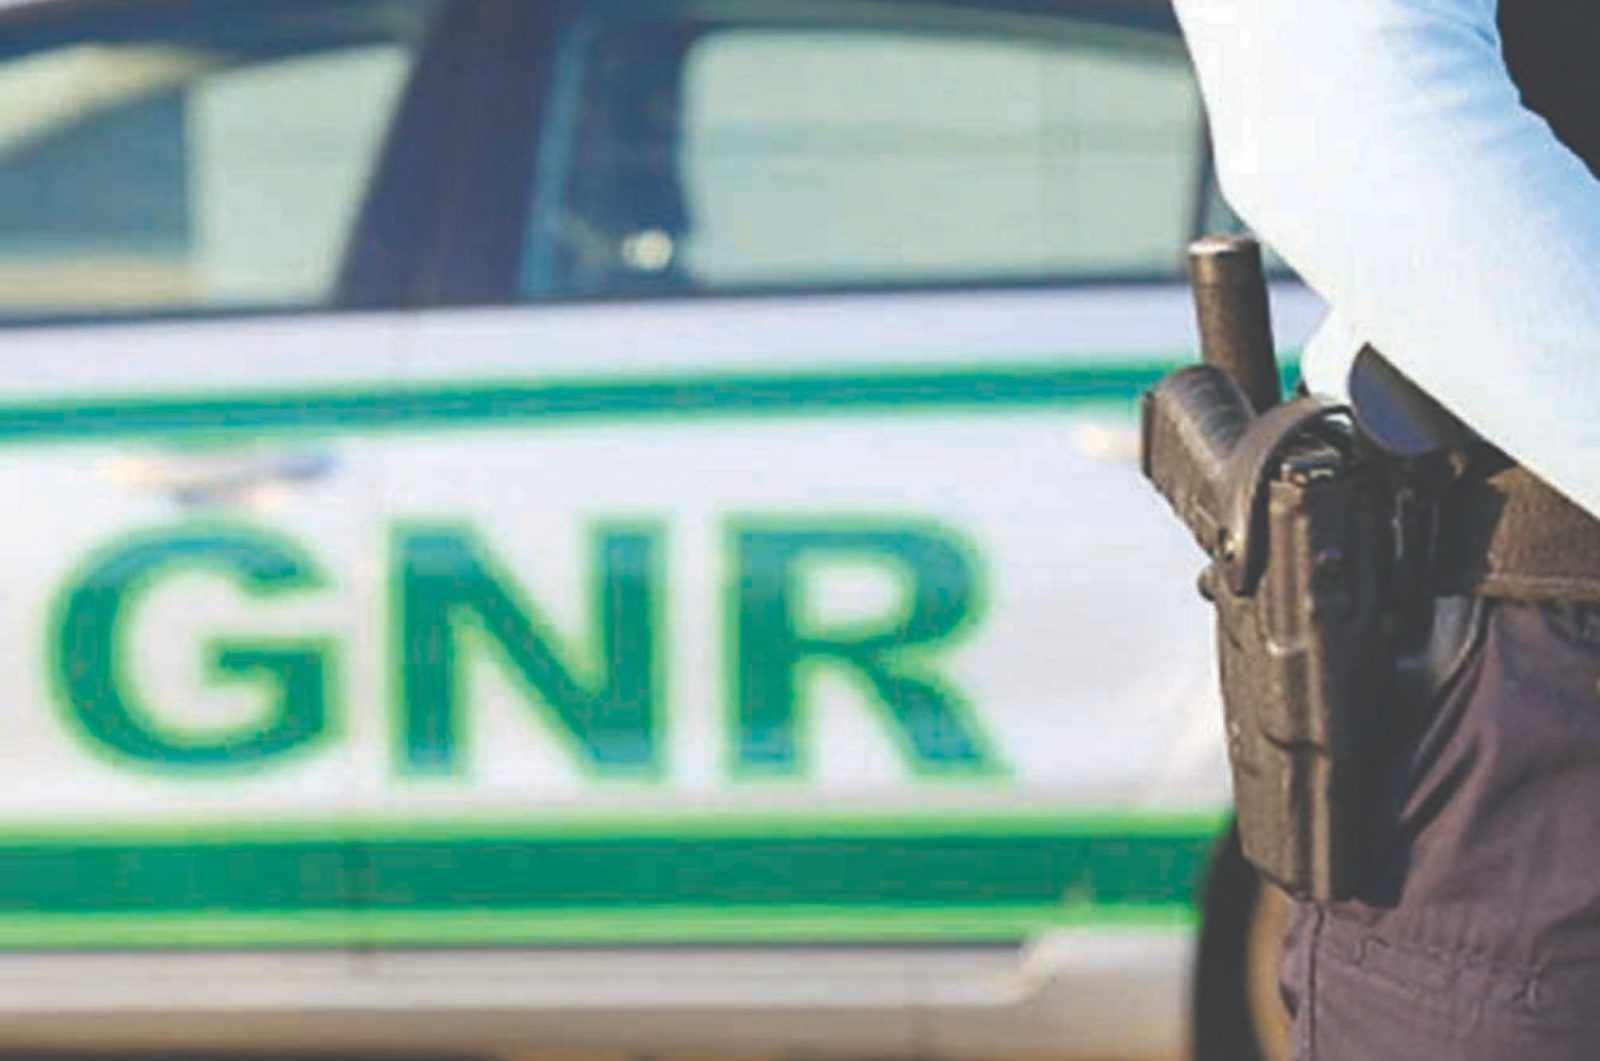 Covilhã: GNR deteve homem por violência doméstica